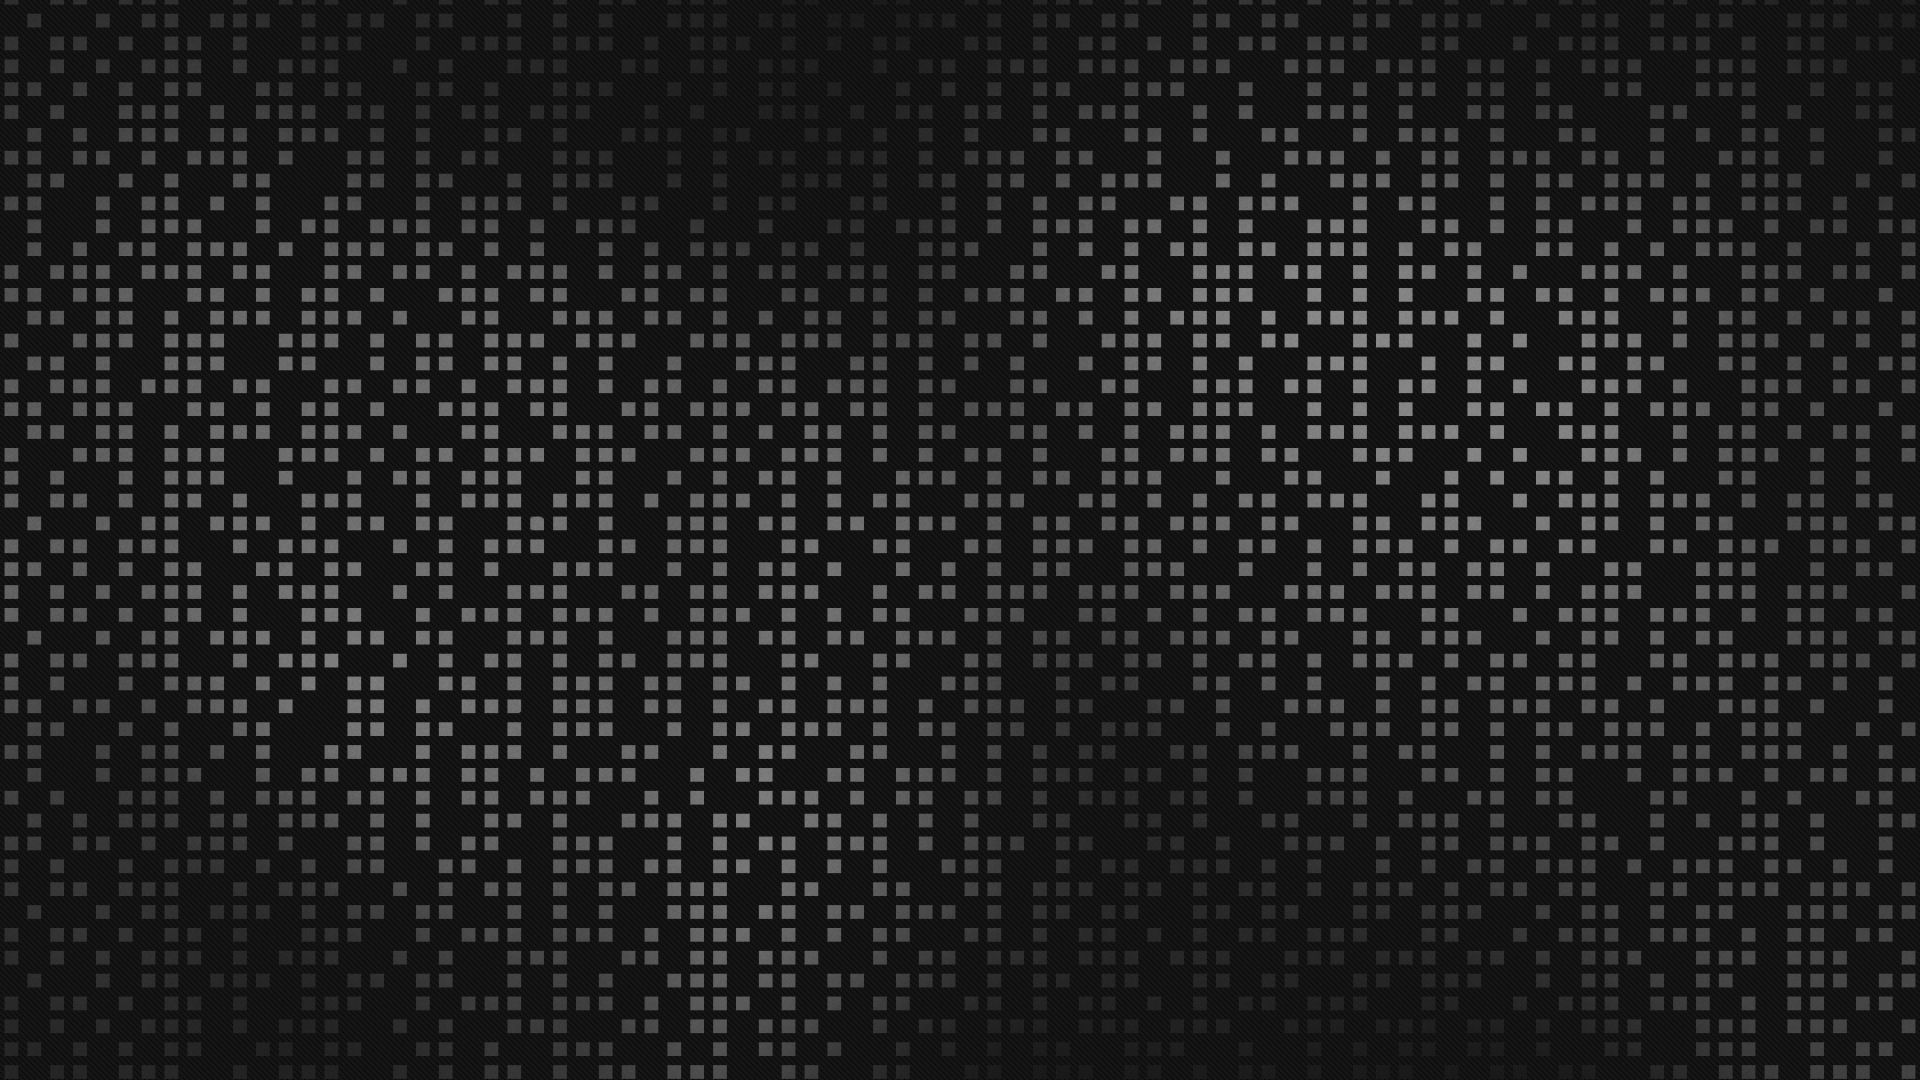 Dots Free Download Wallpaper